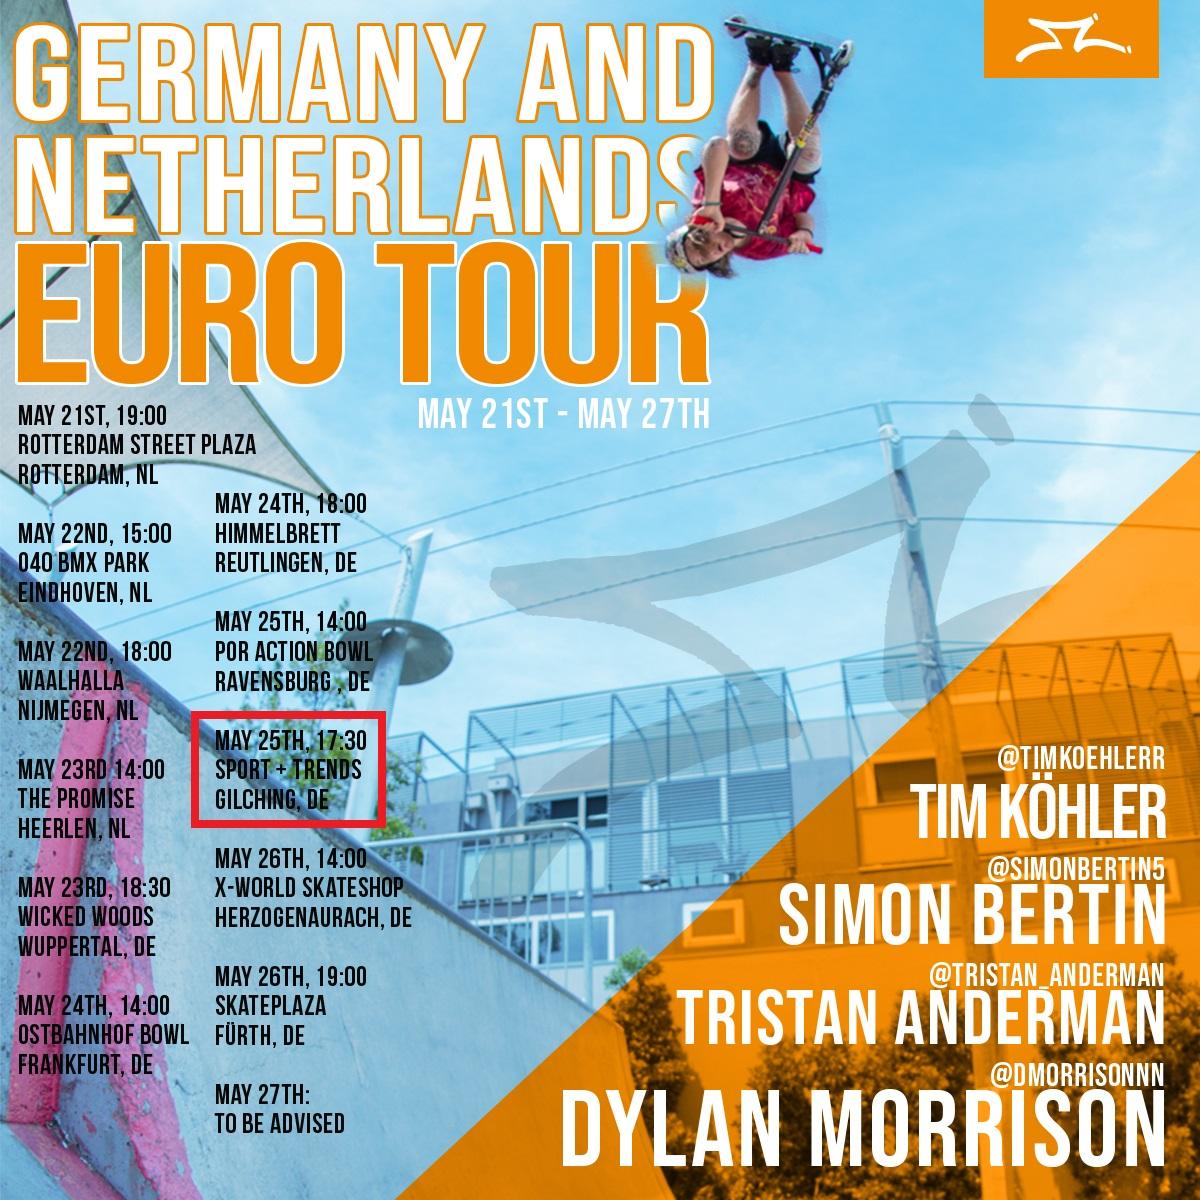 ao germany and netherlands tour flyerneu.jpg